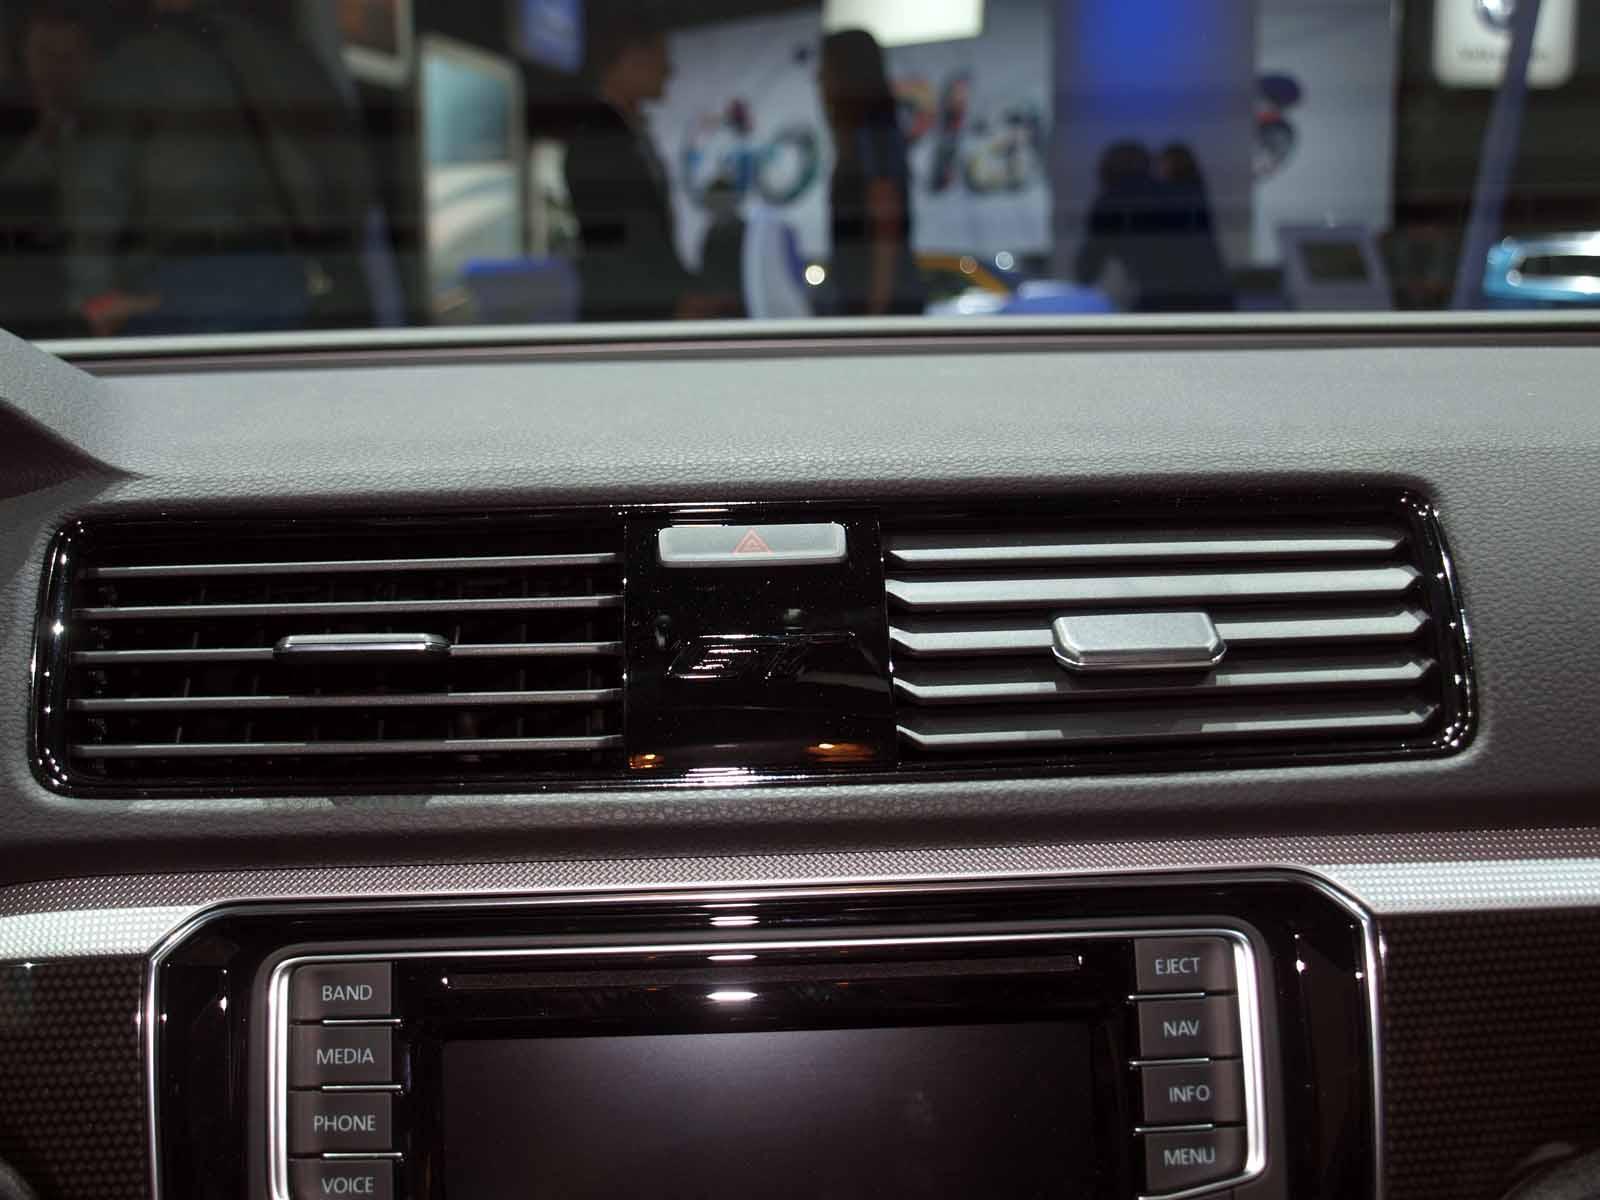 2017 Audi A4 vs 2017 BMW 330i 004 JY 600x300 photo